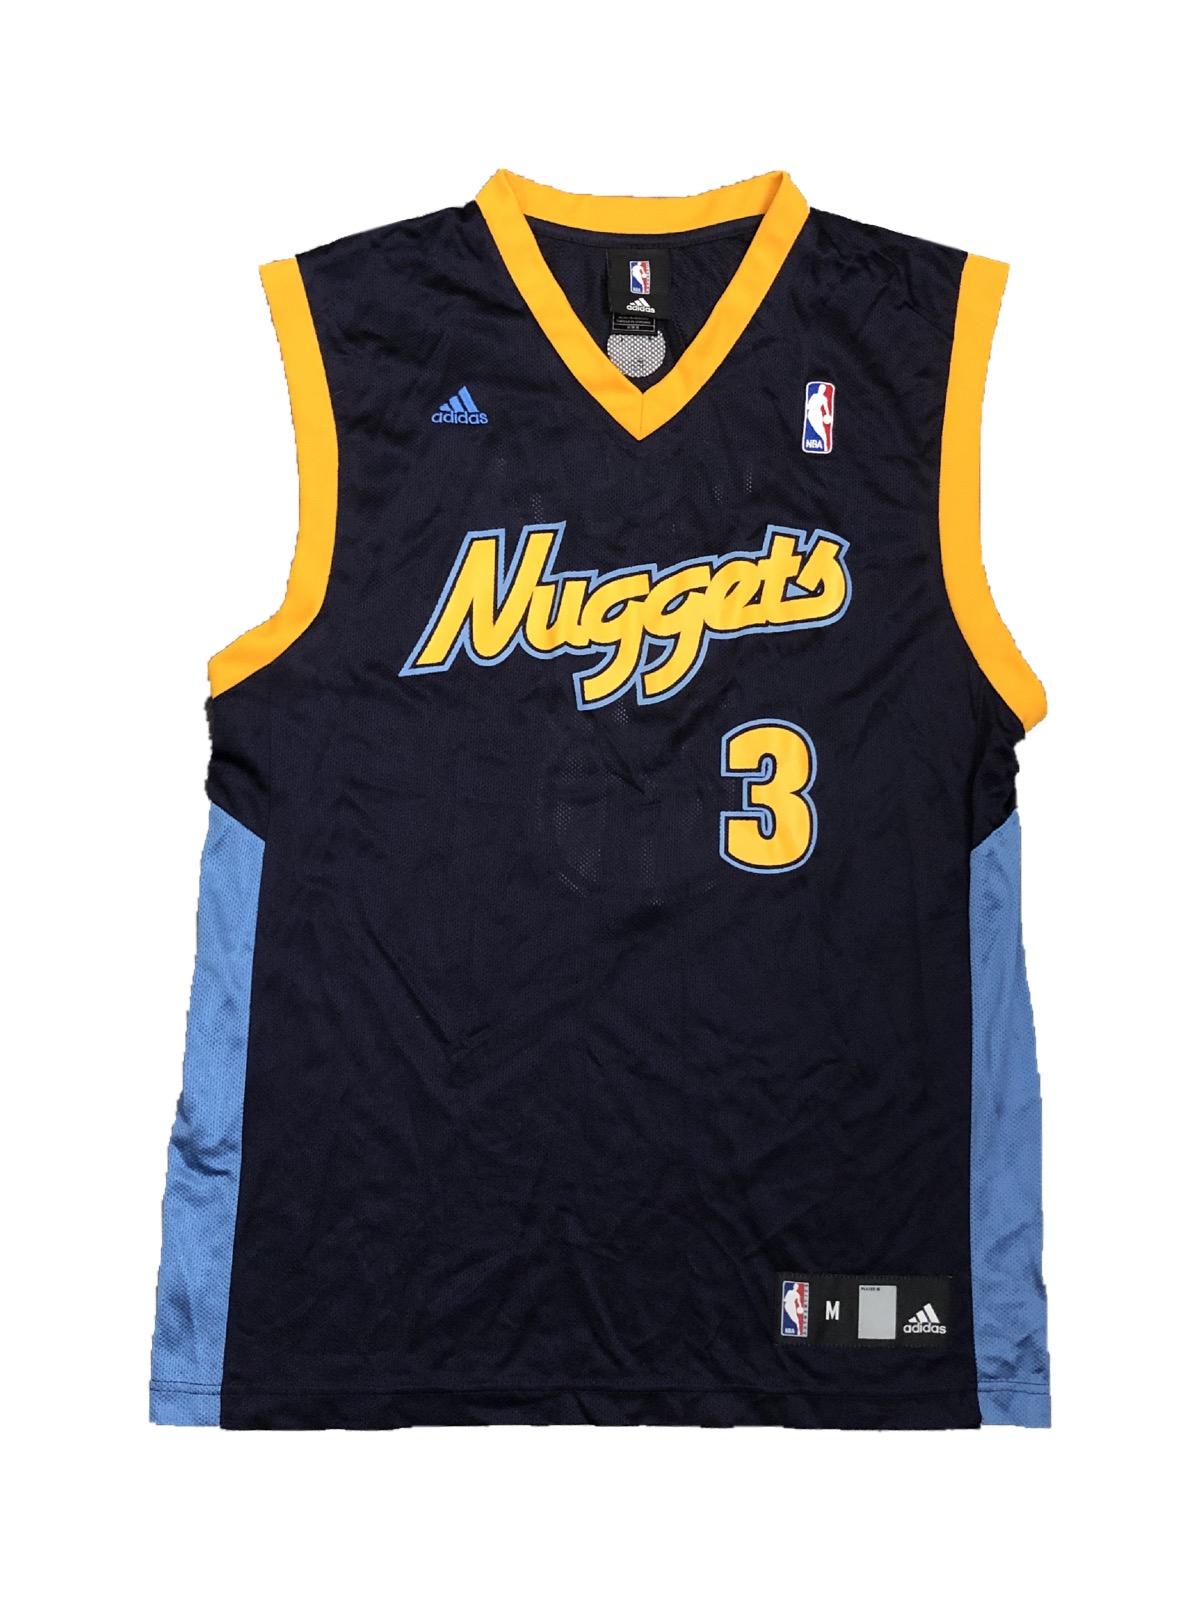 reputable site 56148 f2fb3 Adidas Denver Nuggets Allen Iverson Jersey